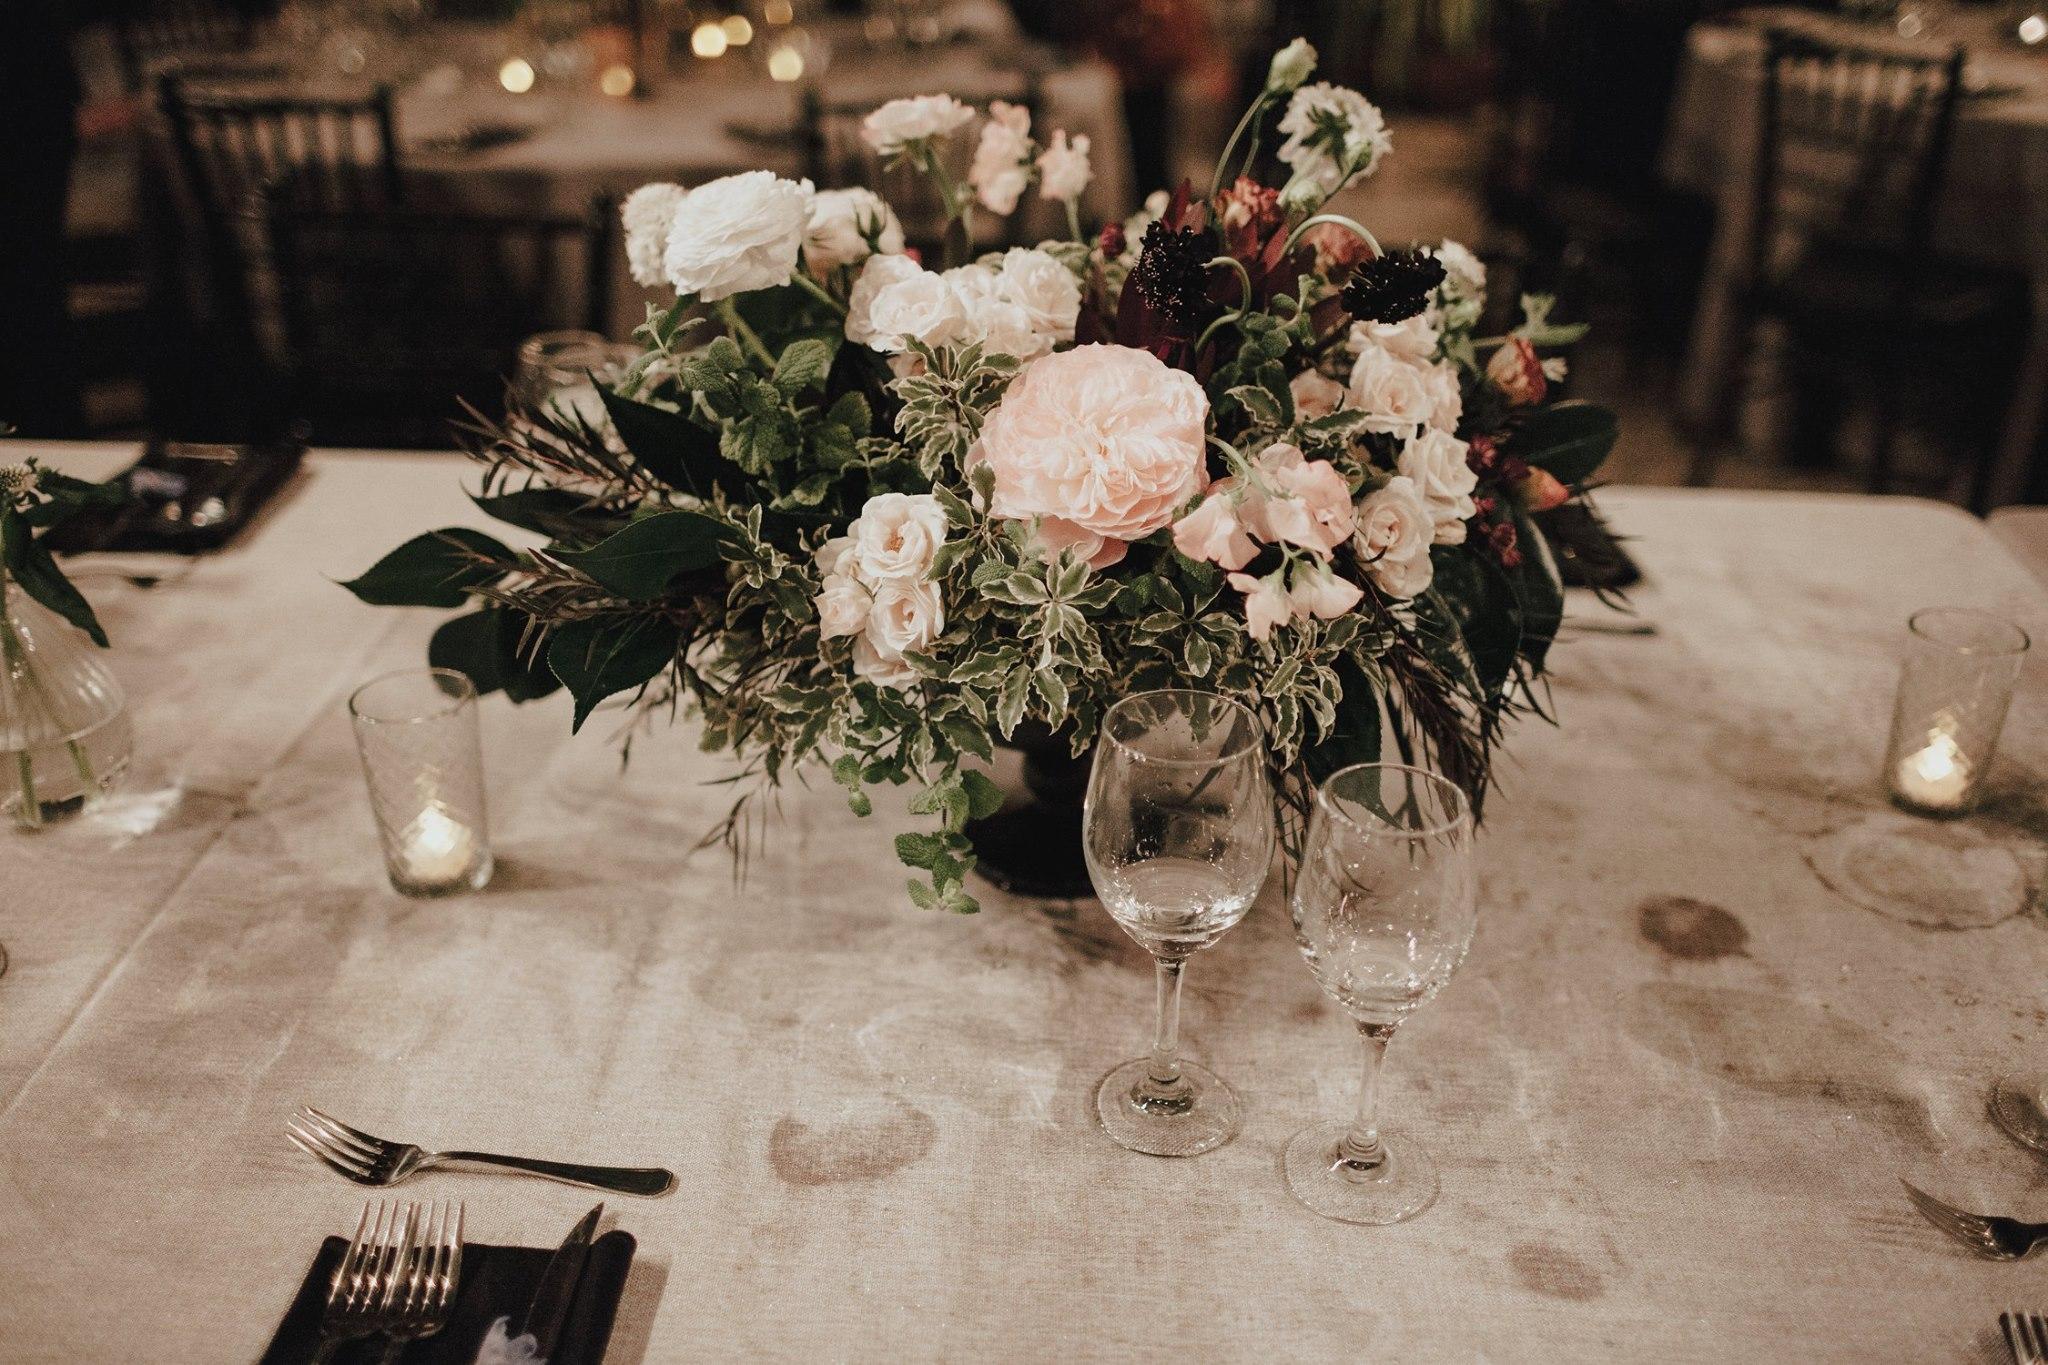 Catering Luxury Destination Wedding in Miami 33.jpg